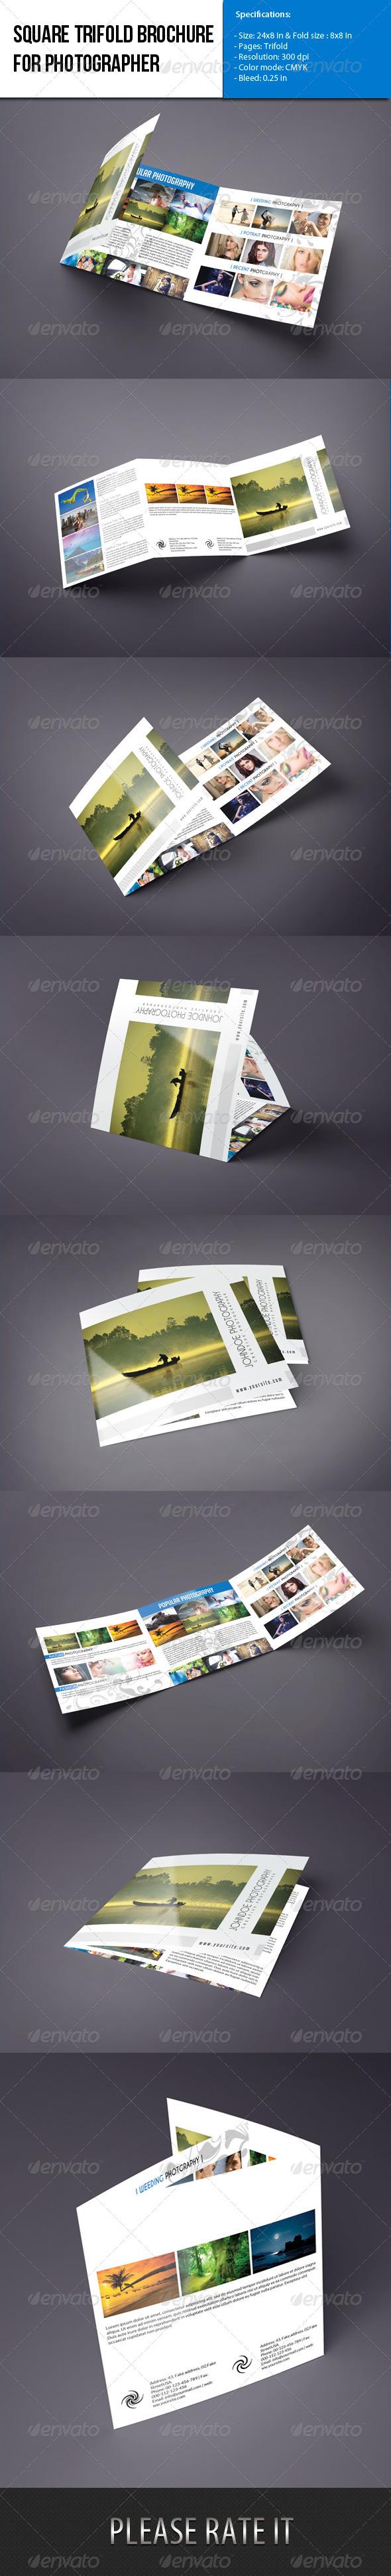 Square Trifold brochure-Photographer Portfolio - Portfolio Brochures